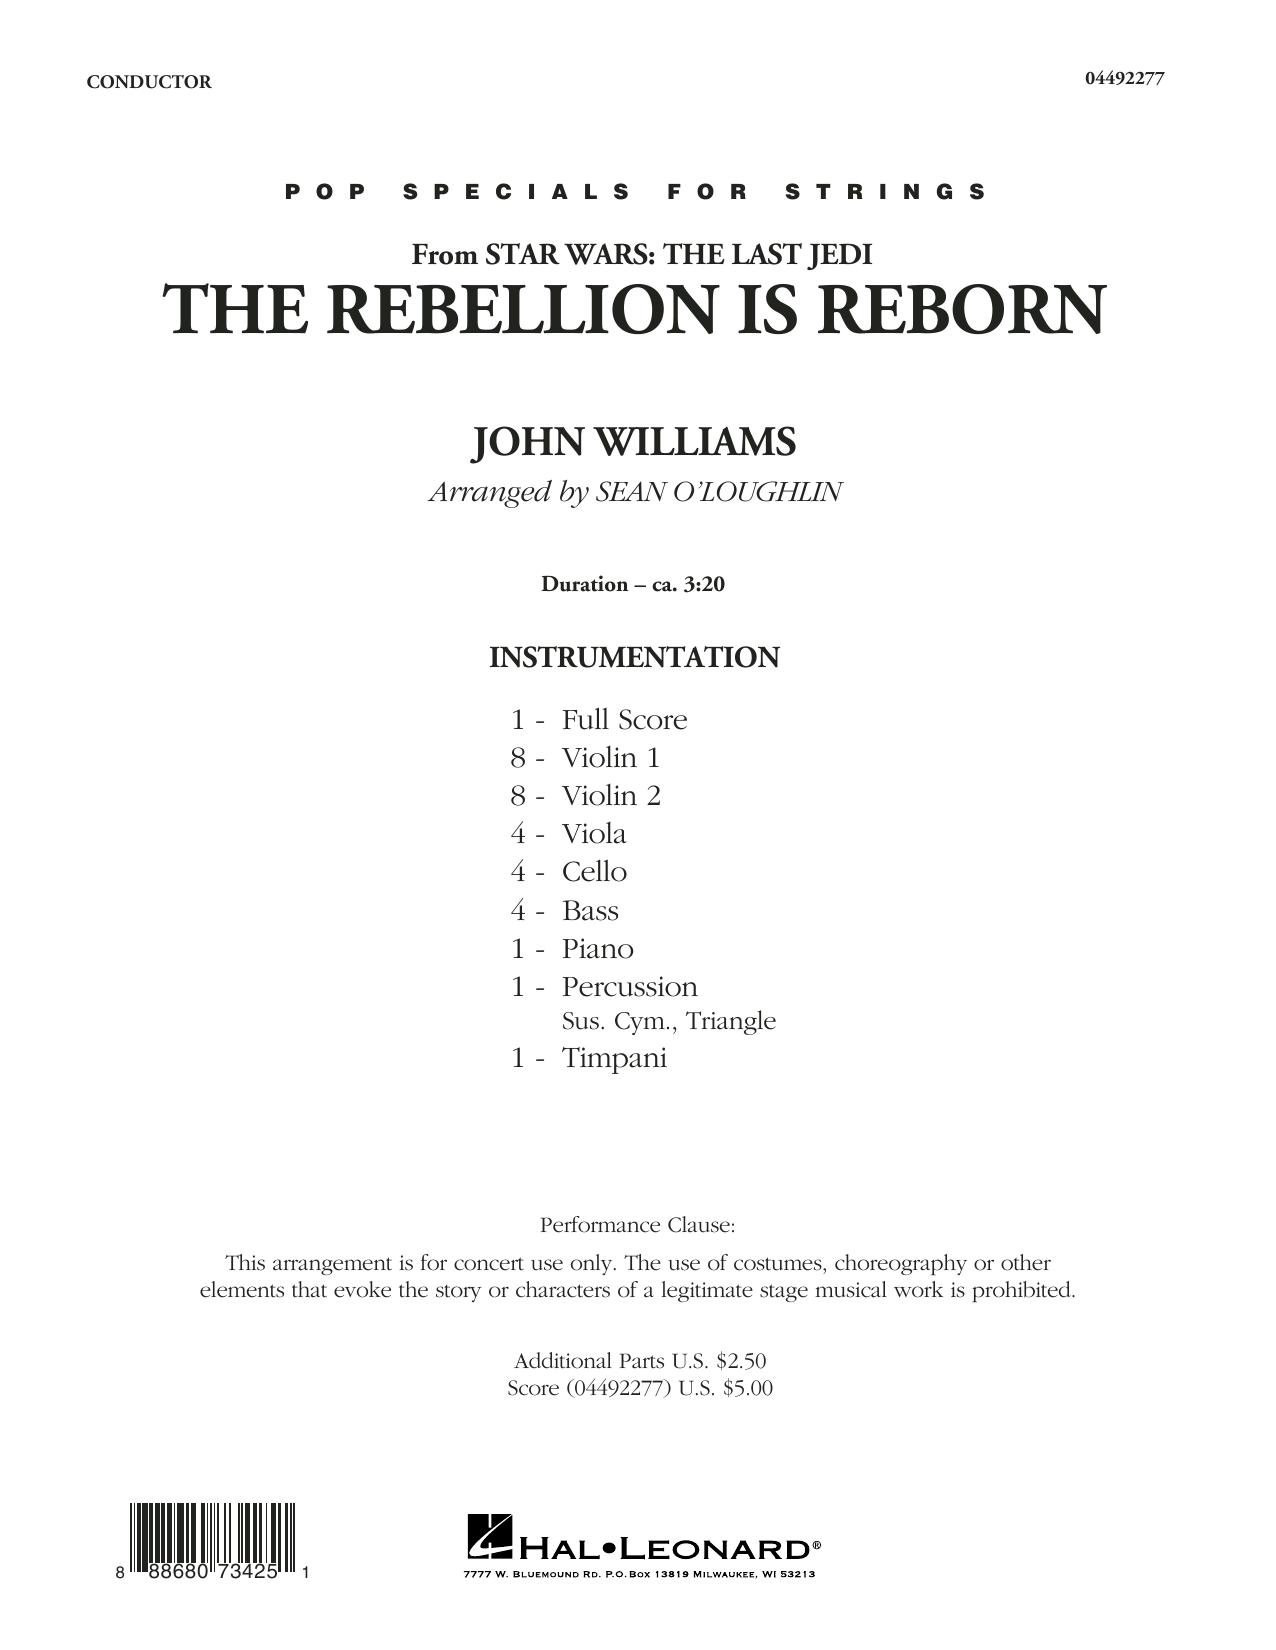 The Rebellion Is Reborn (from Star Wars: The Last Jedi) - Conductor Score (Full Score) (Orchestra)